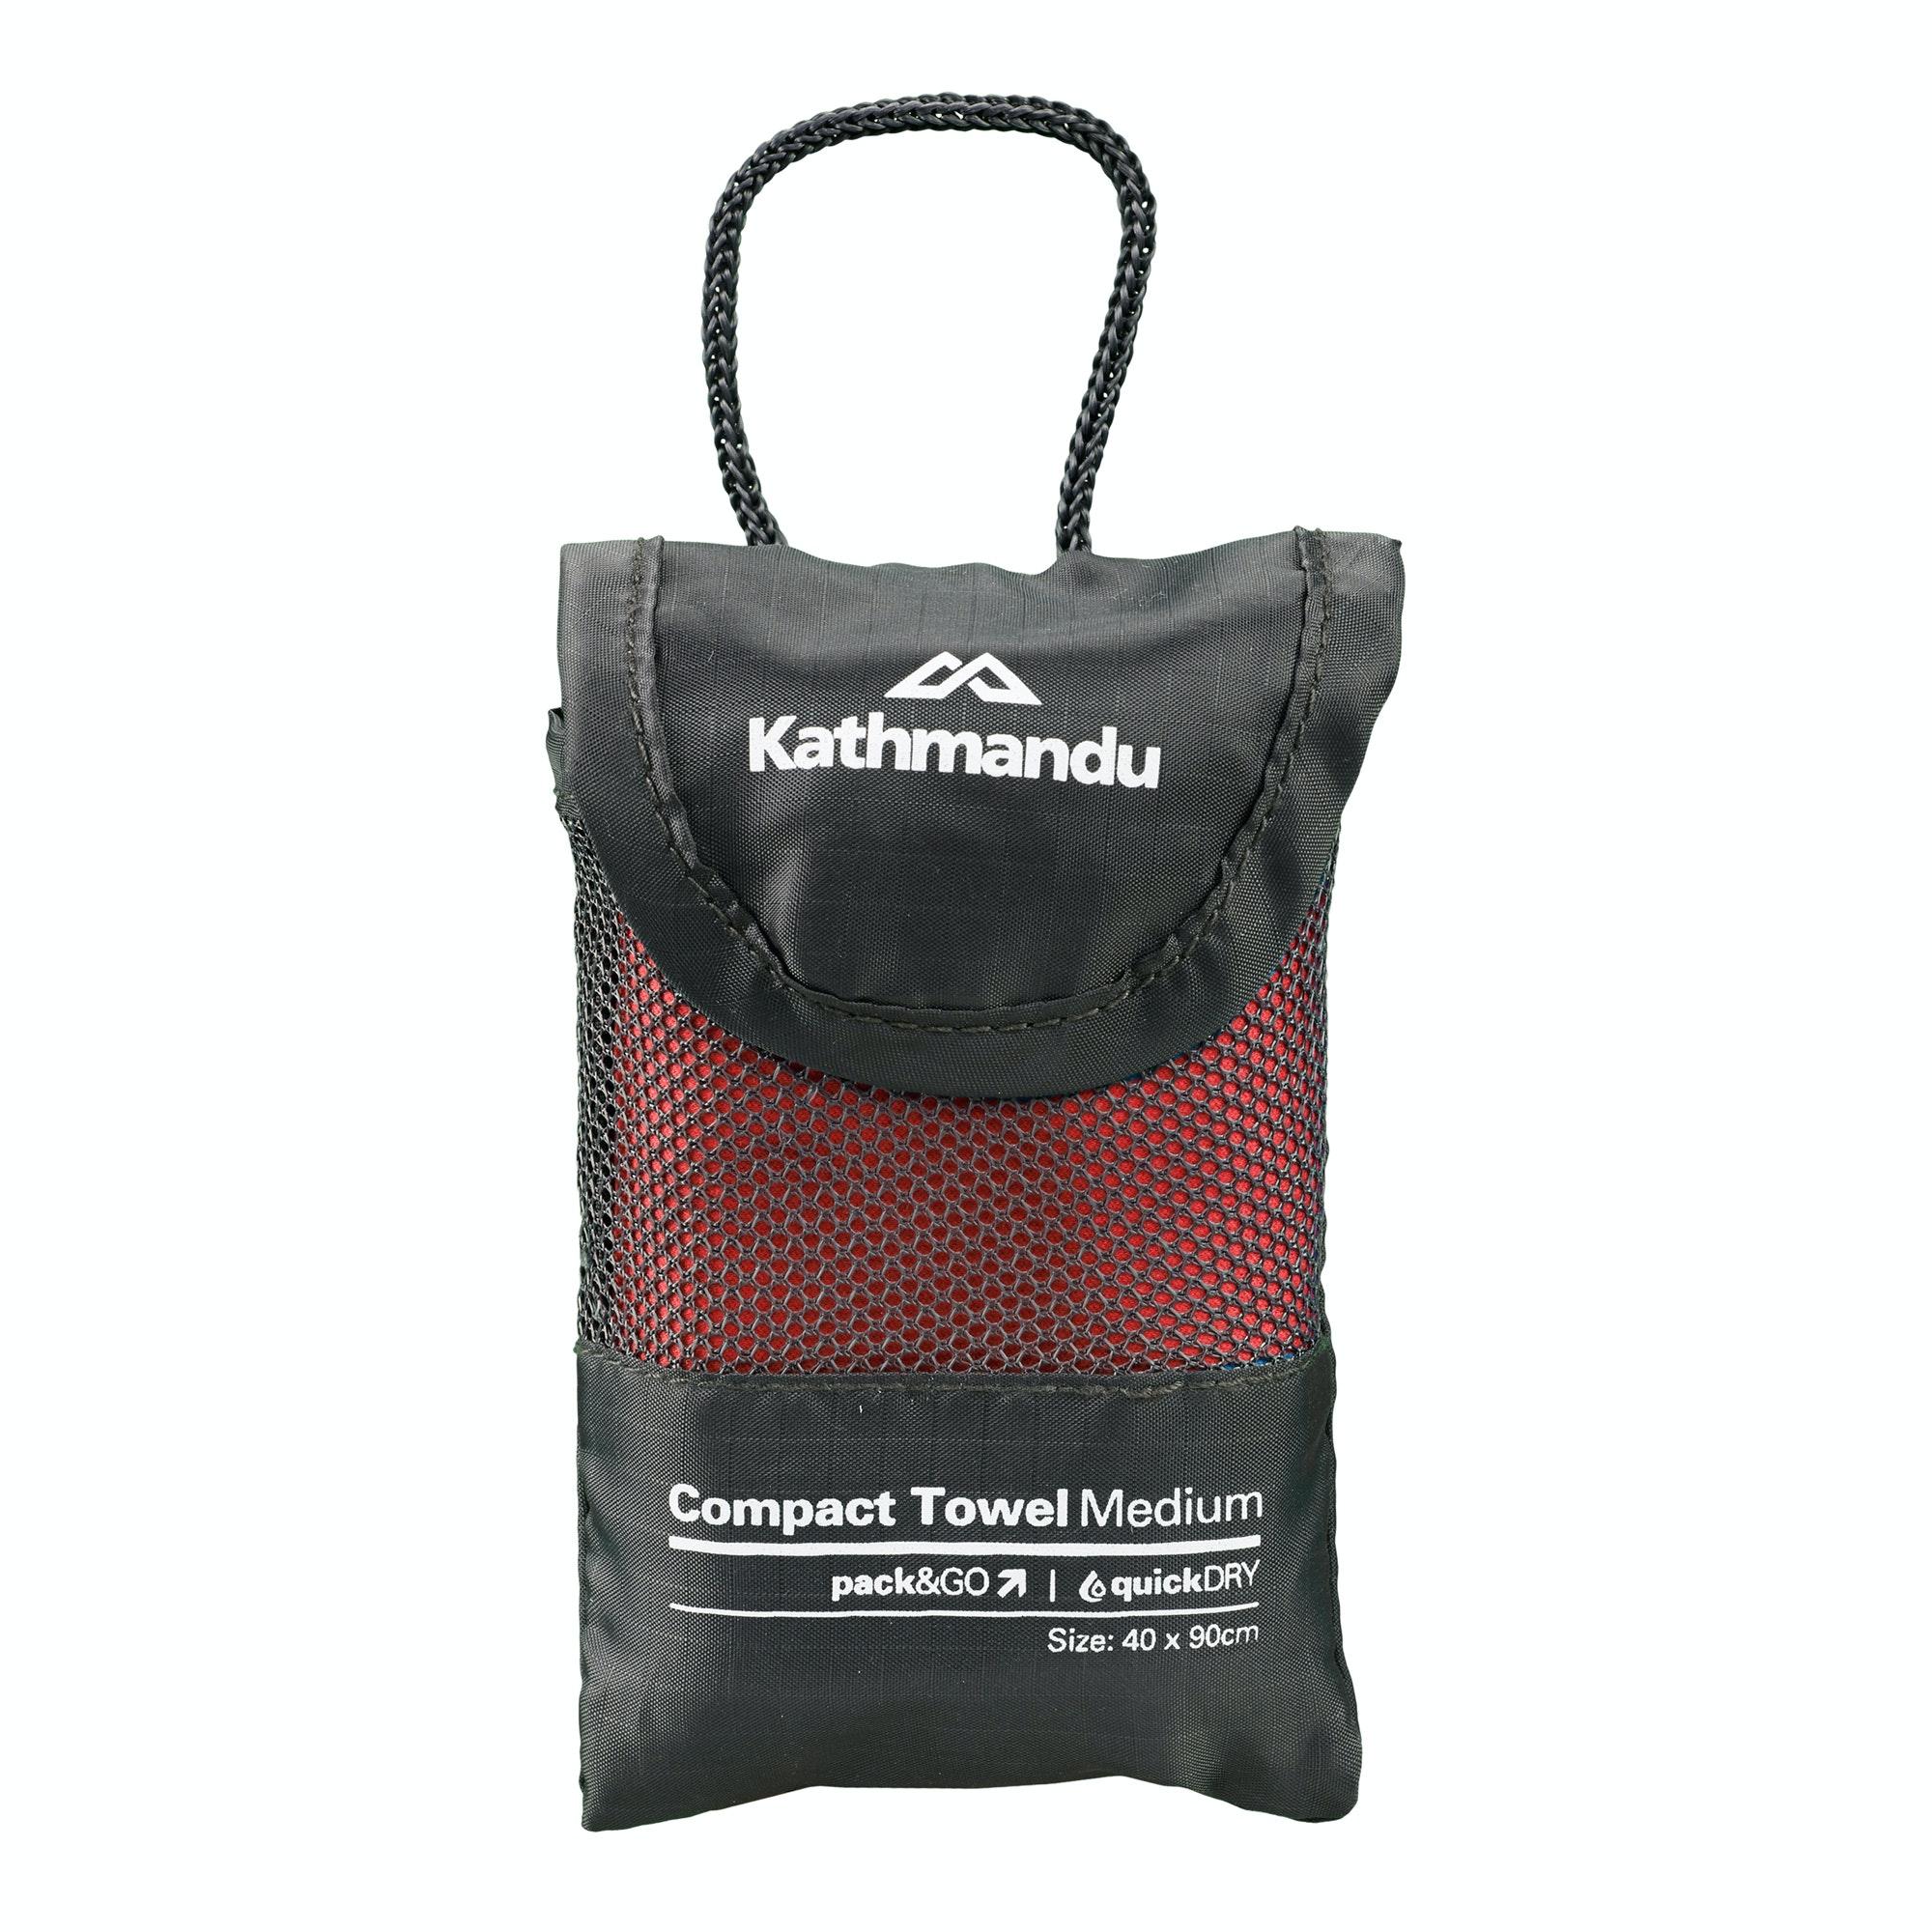 Towel Interstellar Travel: Kathmandu Compact Light Quick Drying Travel Camping Gym